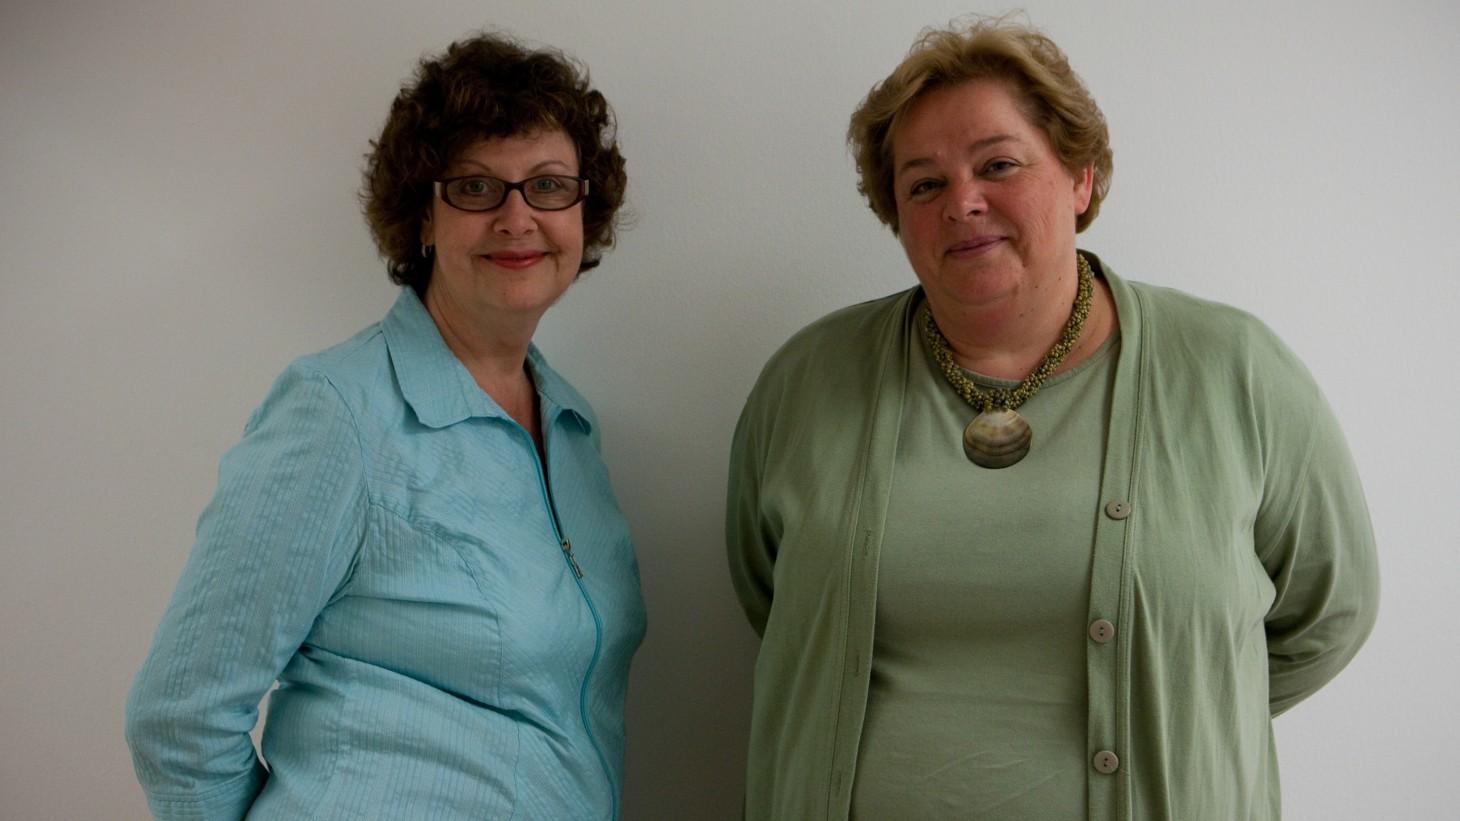 Carol Hammill and Ursula Doidic